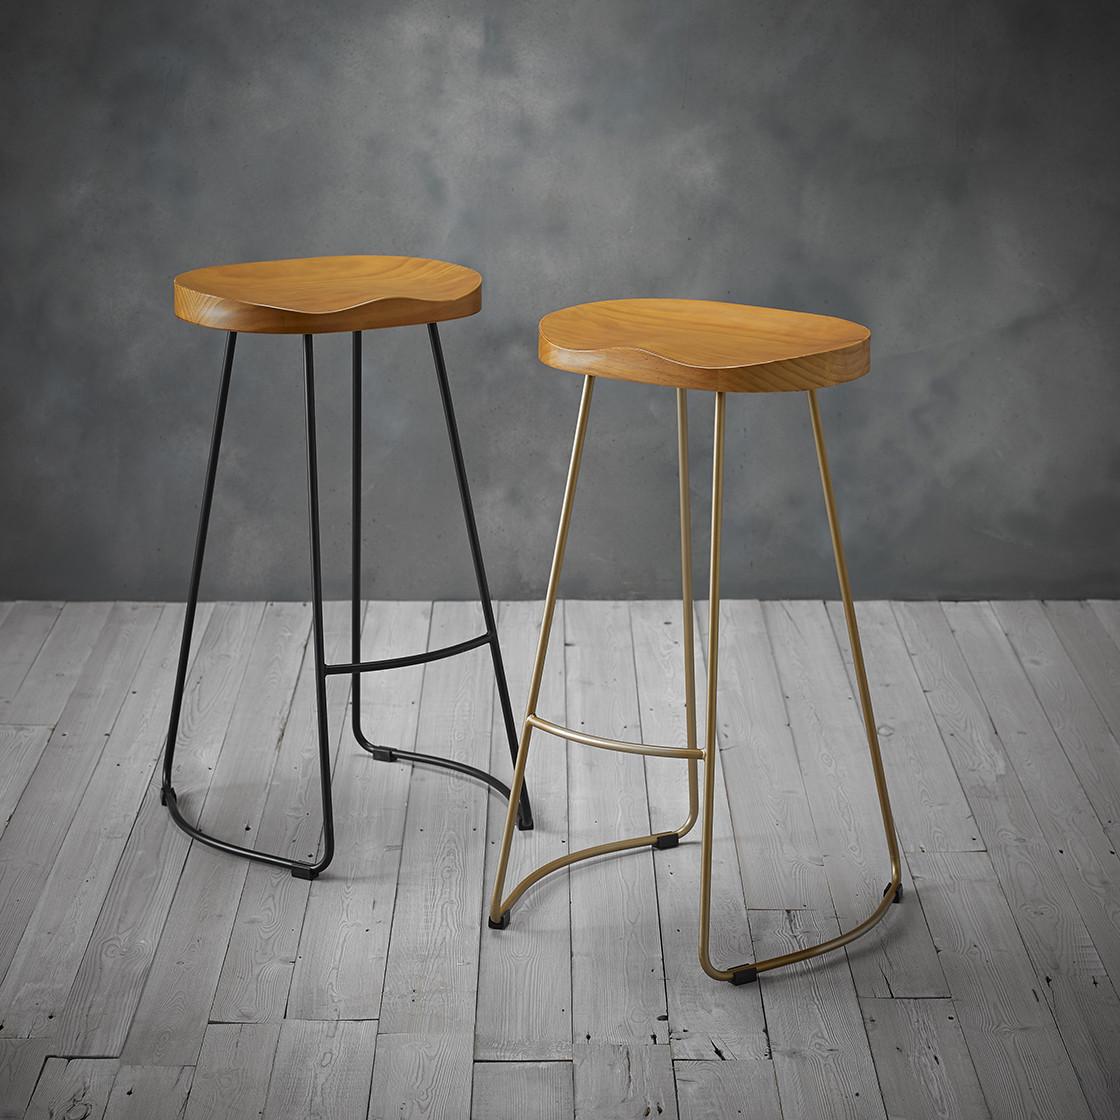 Bailey Pine Wood Seat Gold Effect Leg Bar Stool